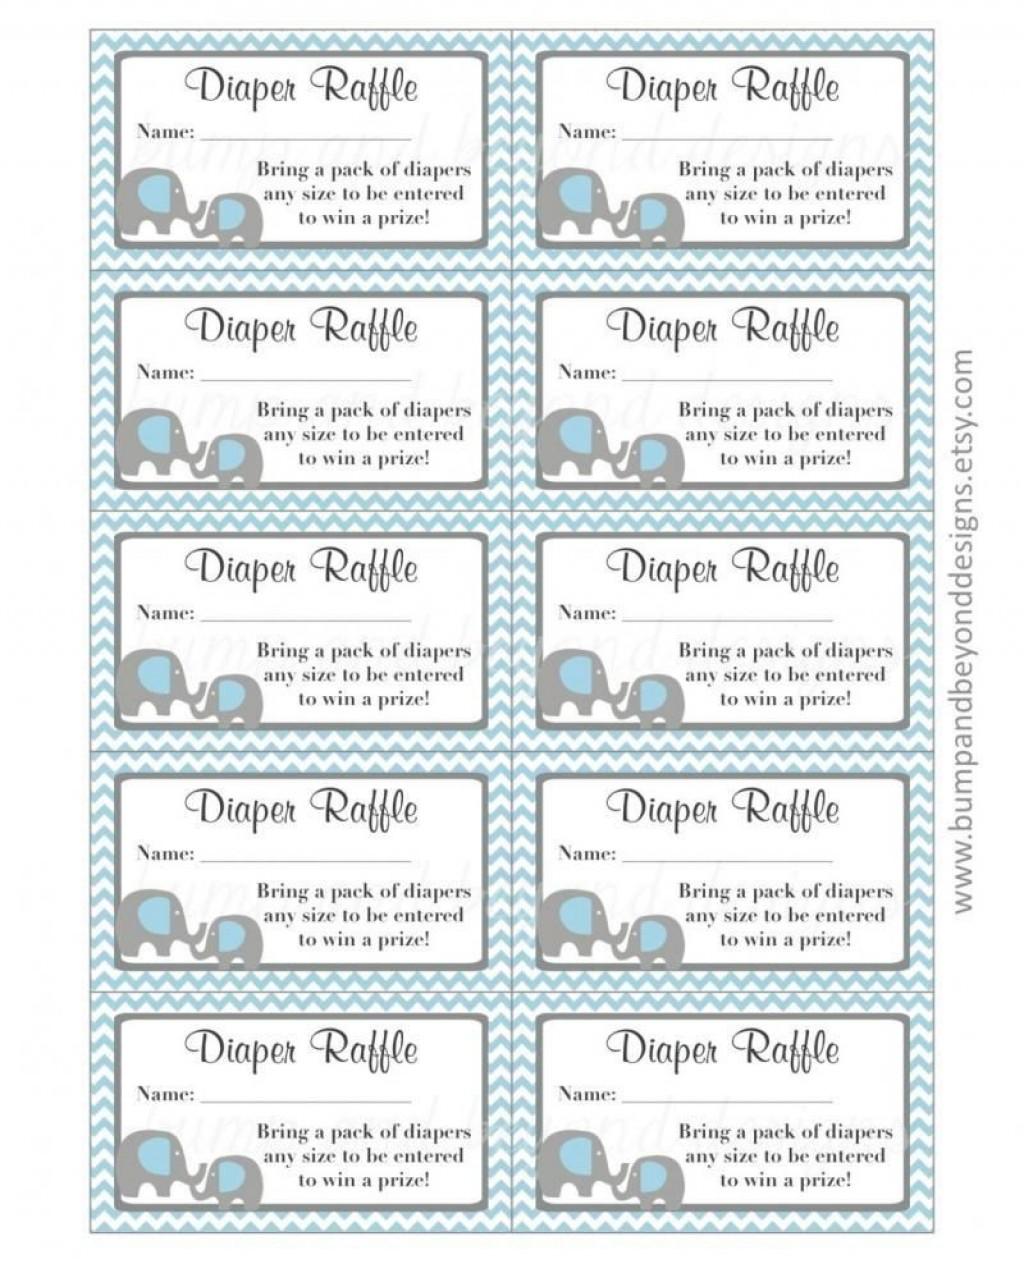 003 Unbelievable Diaper Raffle Ticket Template High Def  Free Printable DownloadLarge